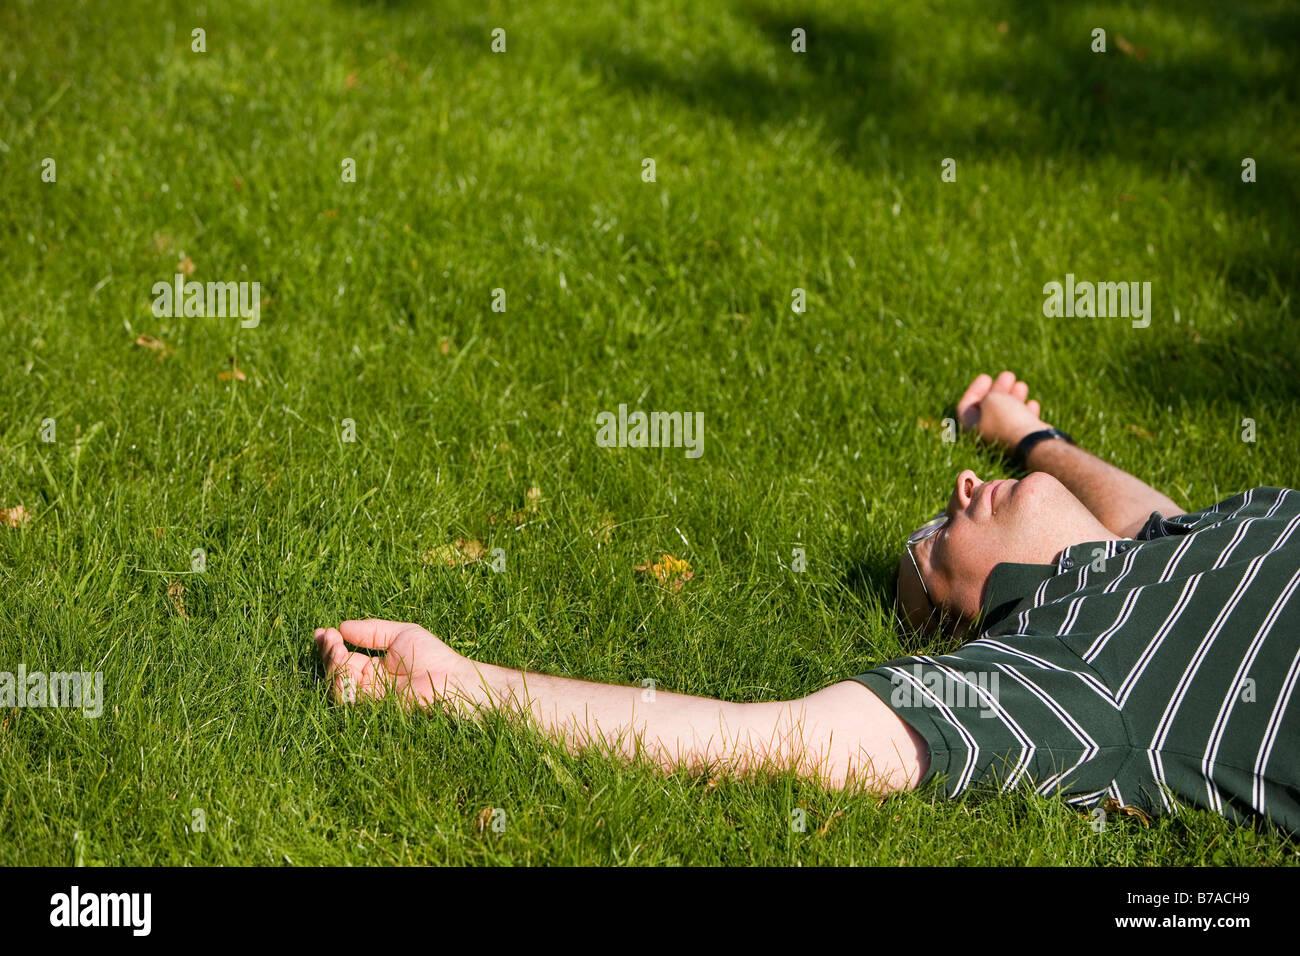 45 year old man enjoying the sun in a meadow - Stock Image